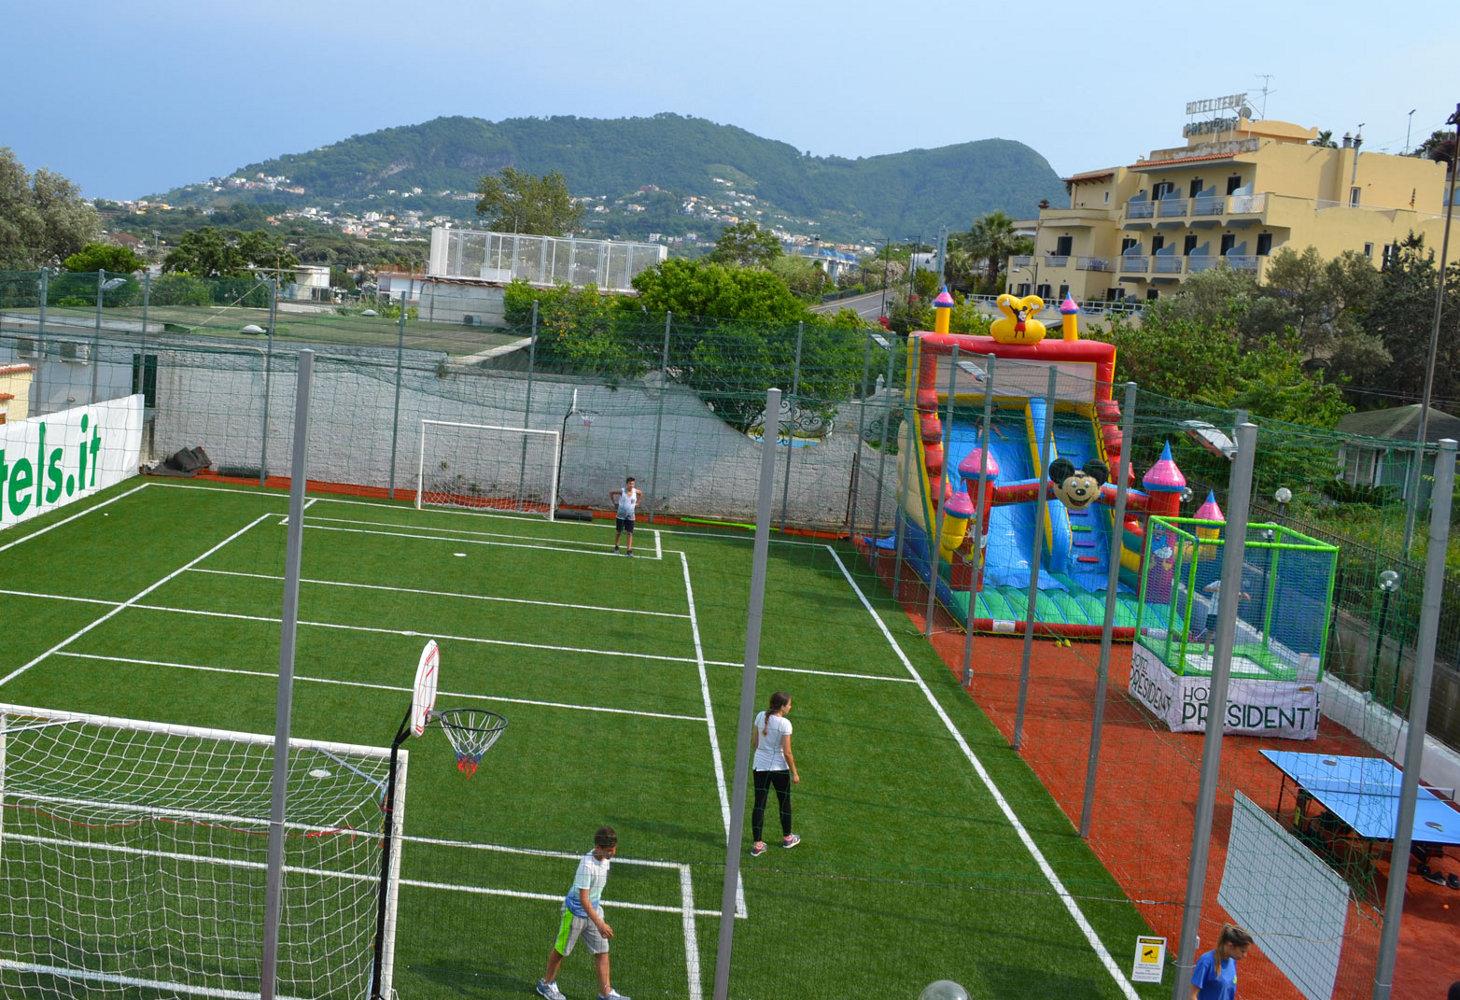 FAMILY VILLAGE PRESIDENT PALACE | Ischia